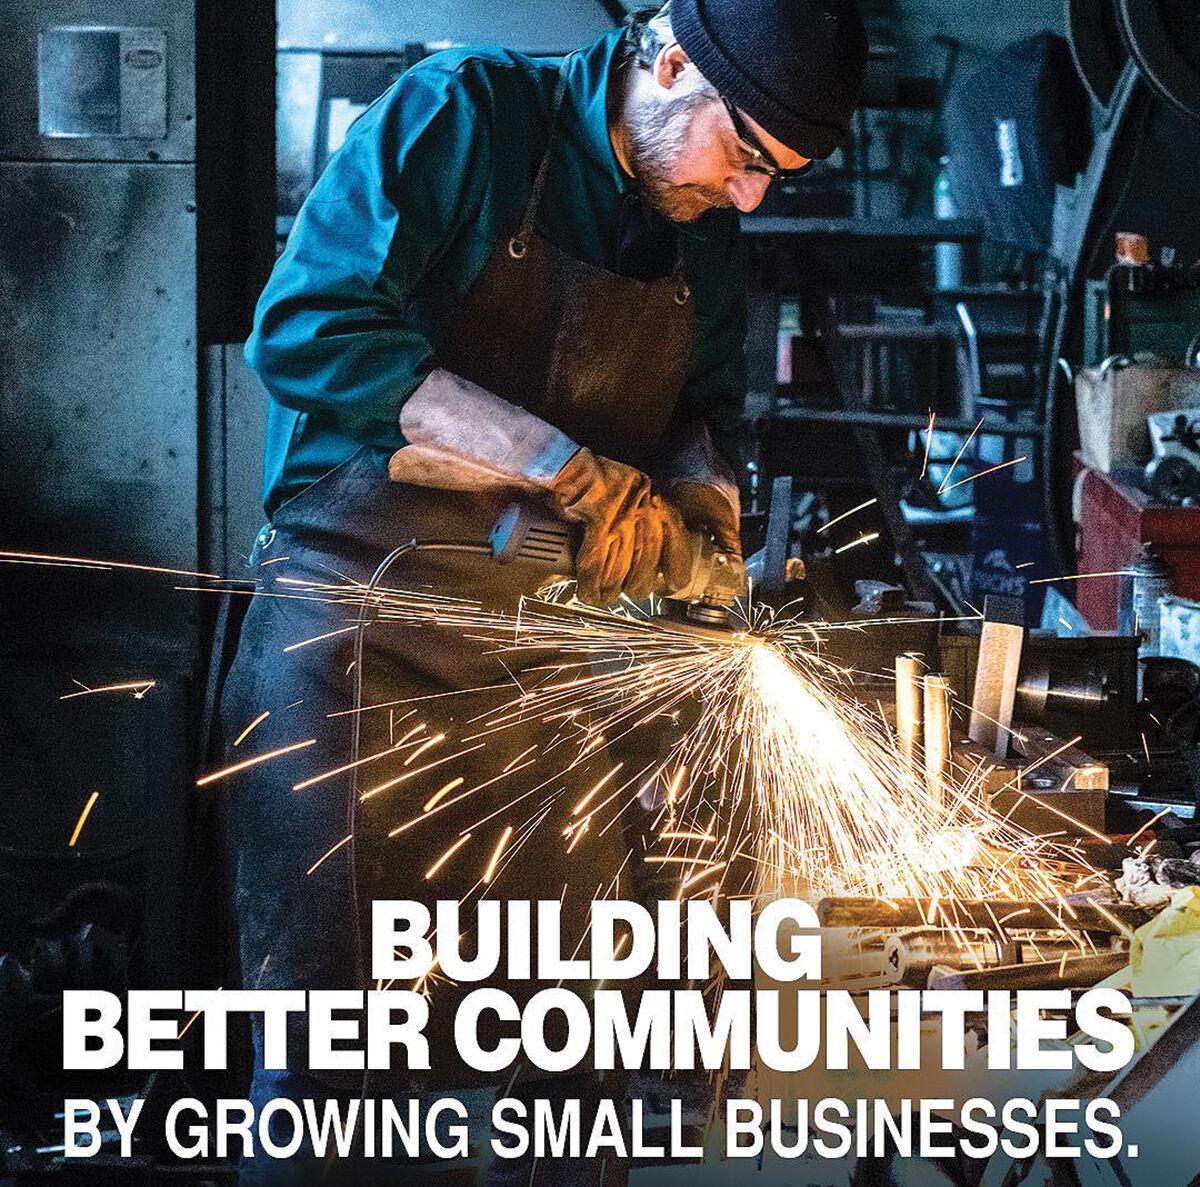 Building Better Communities